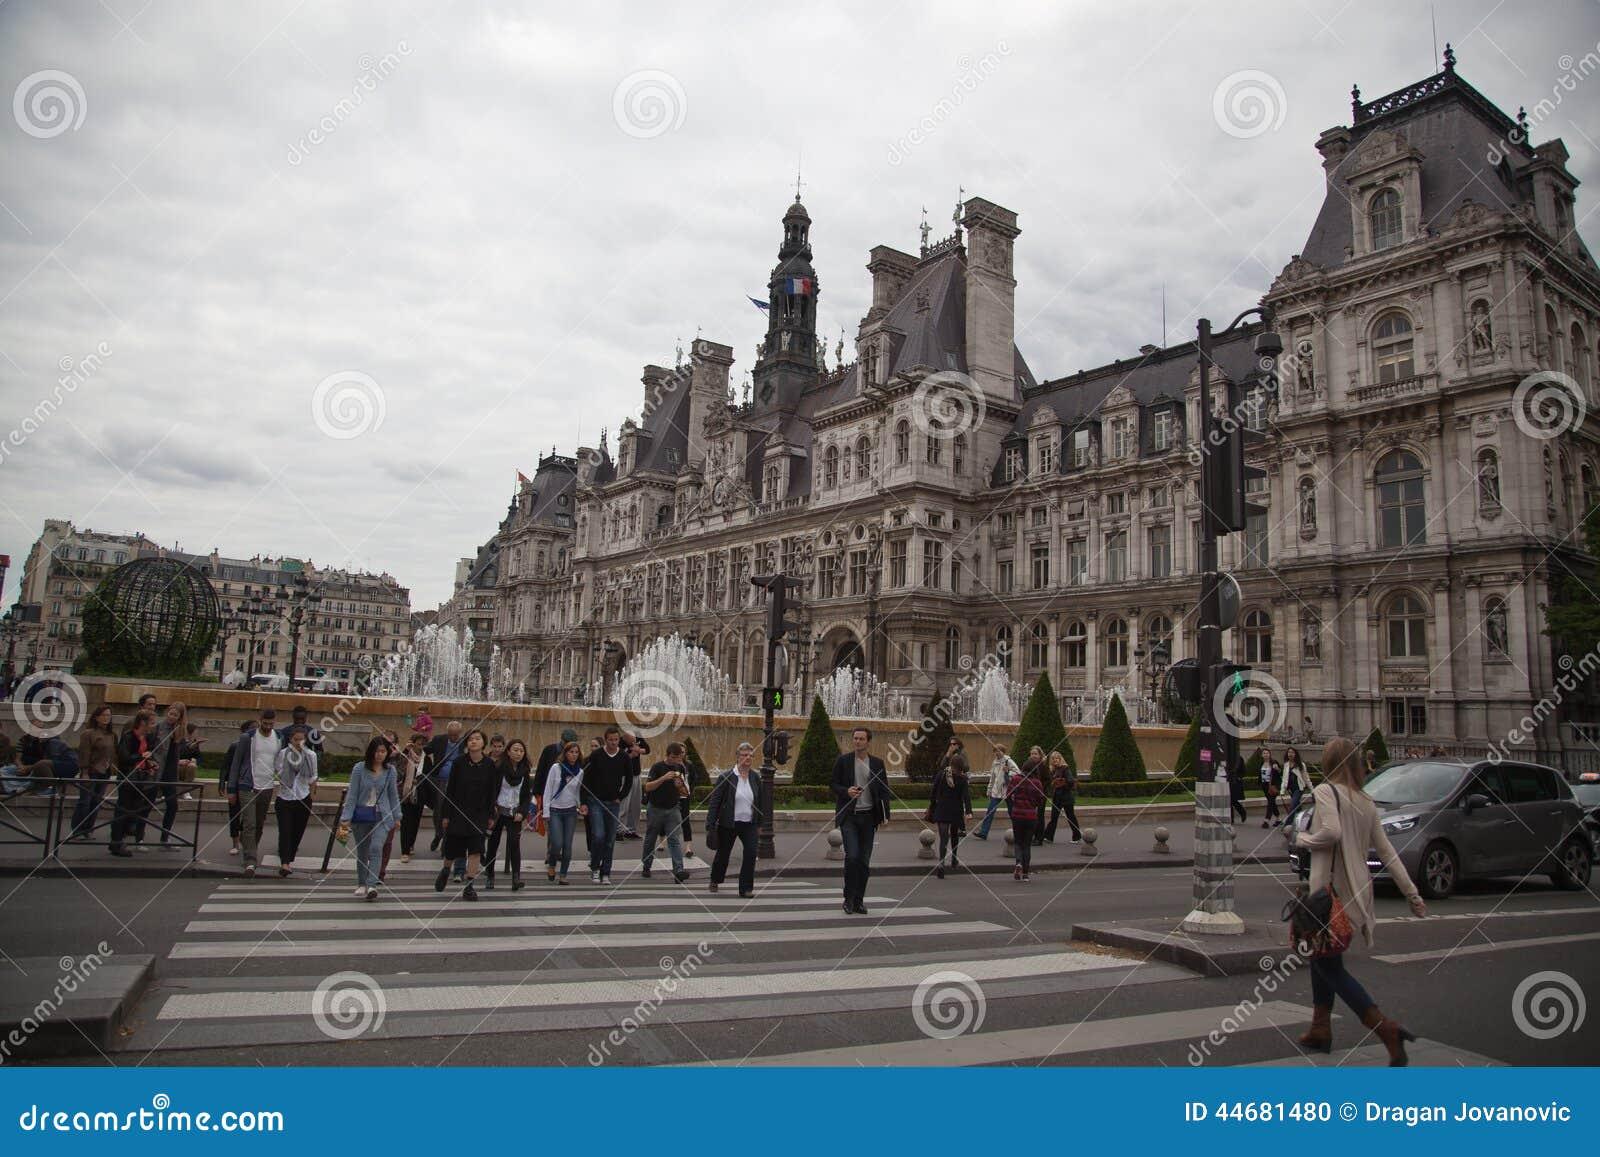 The City Hall Of Paris Editorial Image Image 44681480